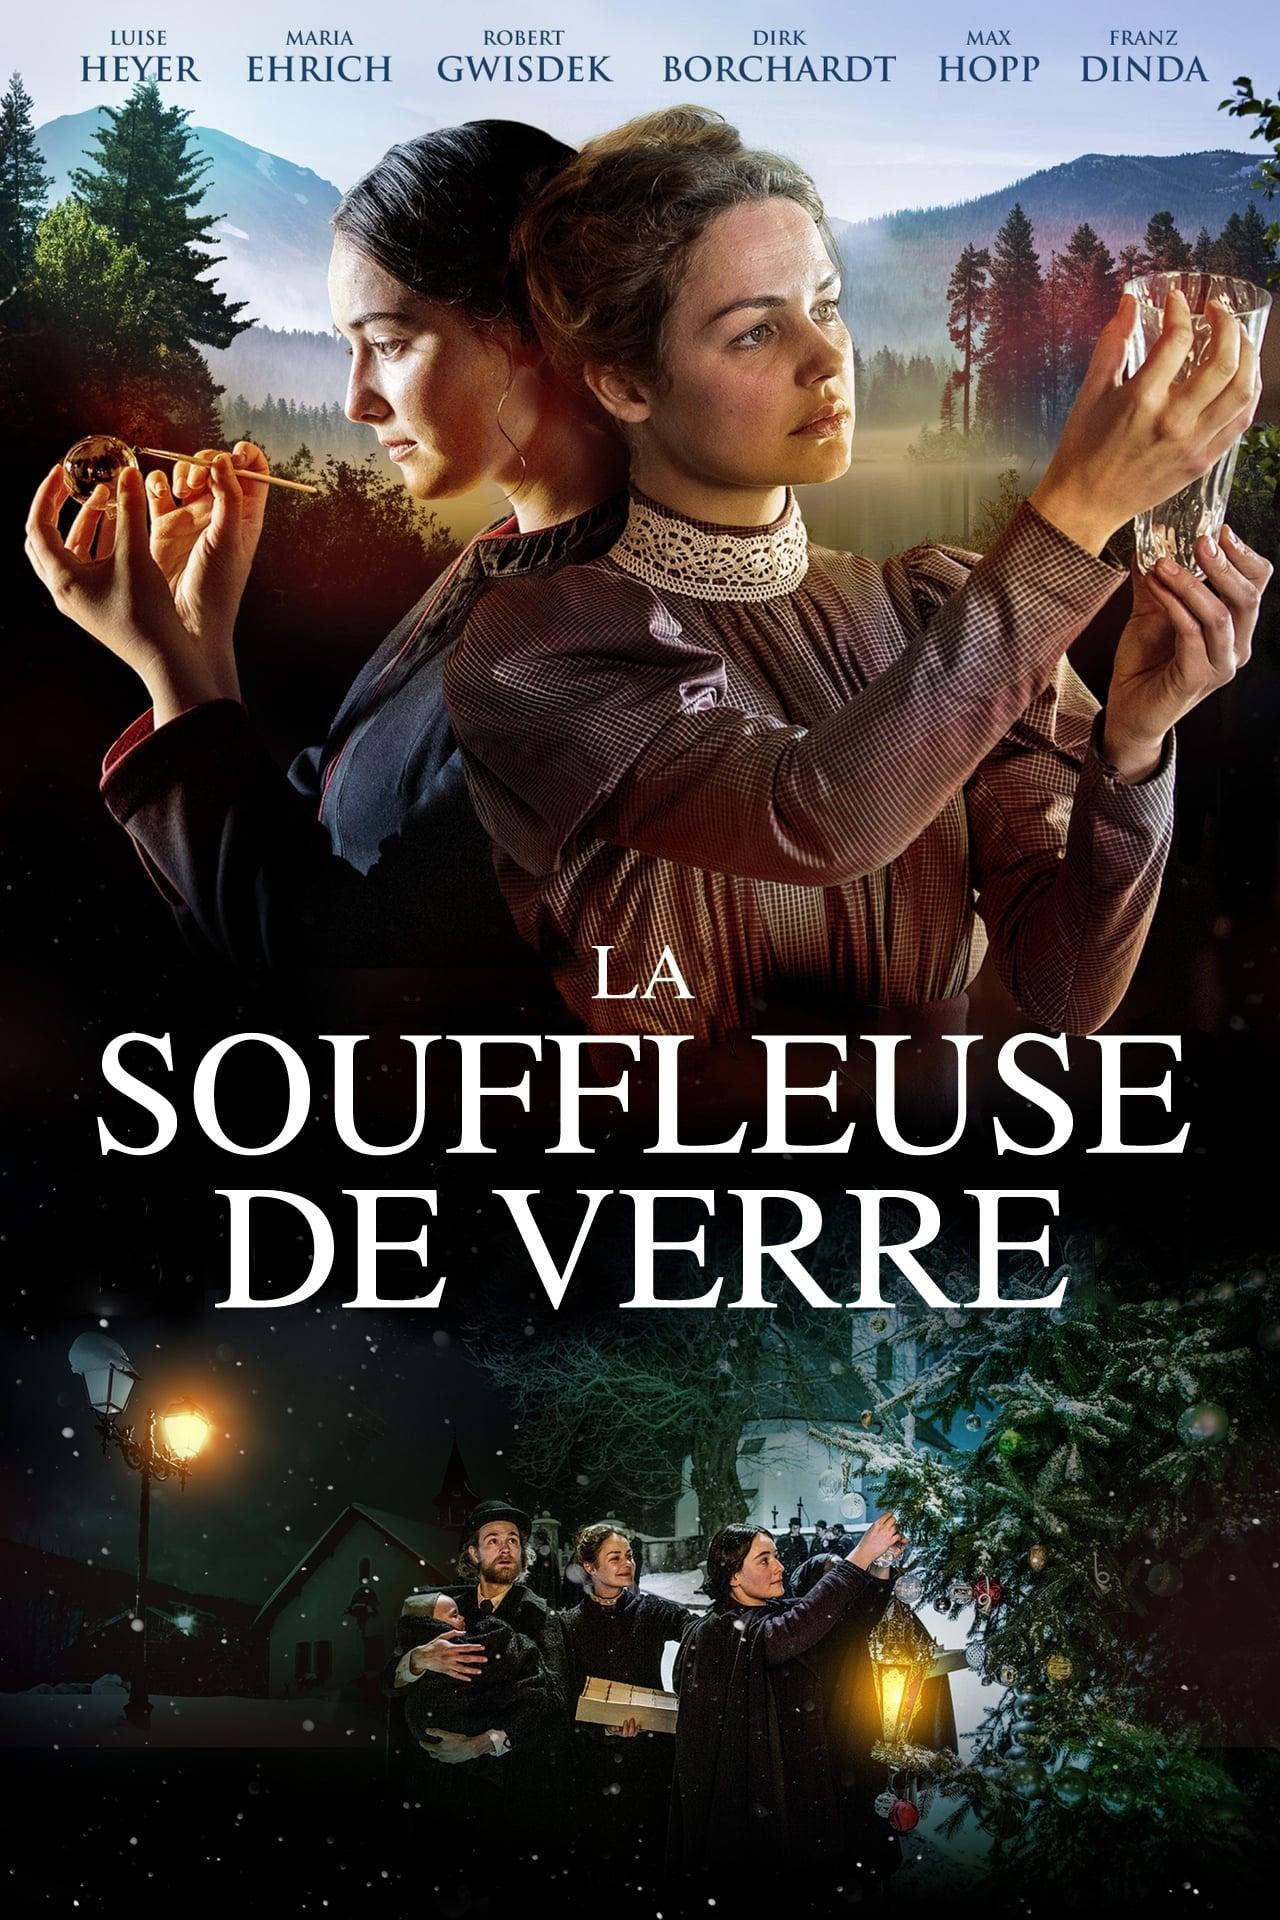 La-Souffleuse-De-Verre-Die-Glasblaserin-2016-9976